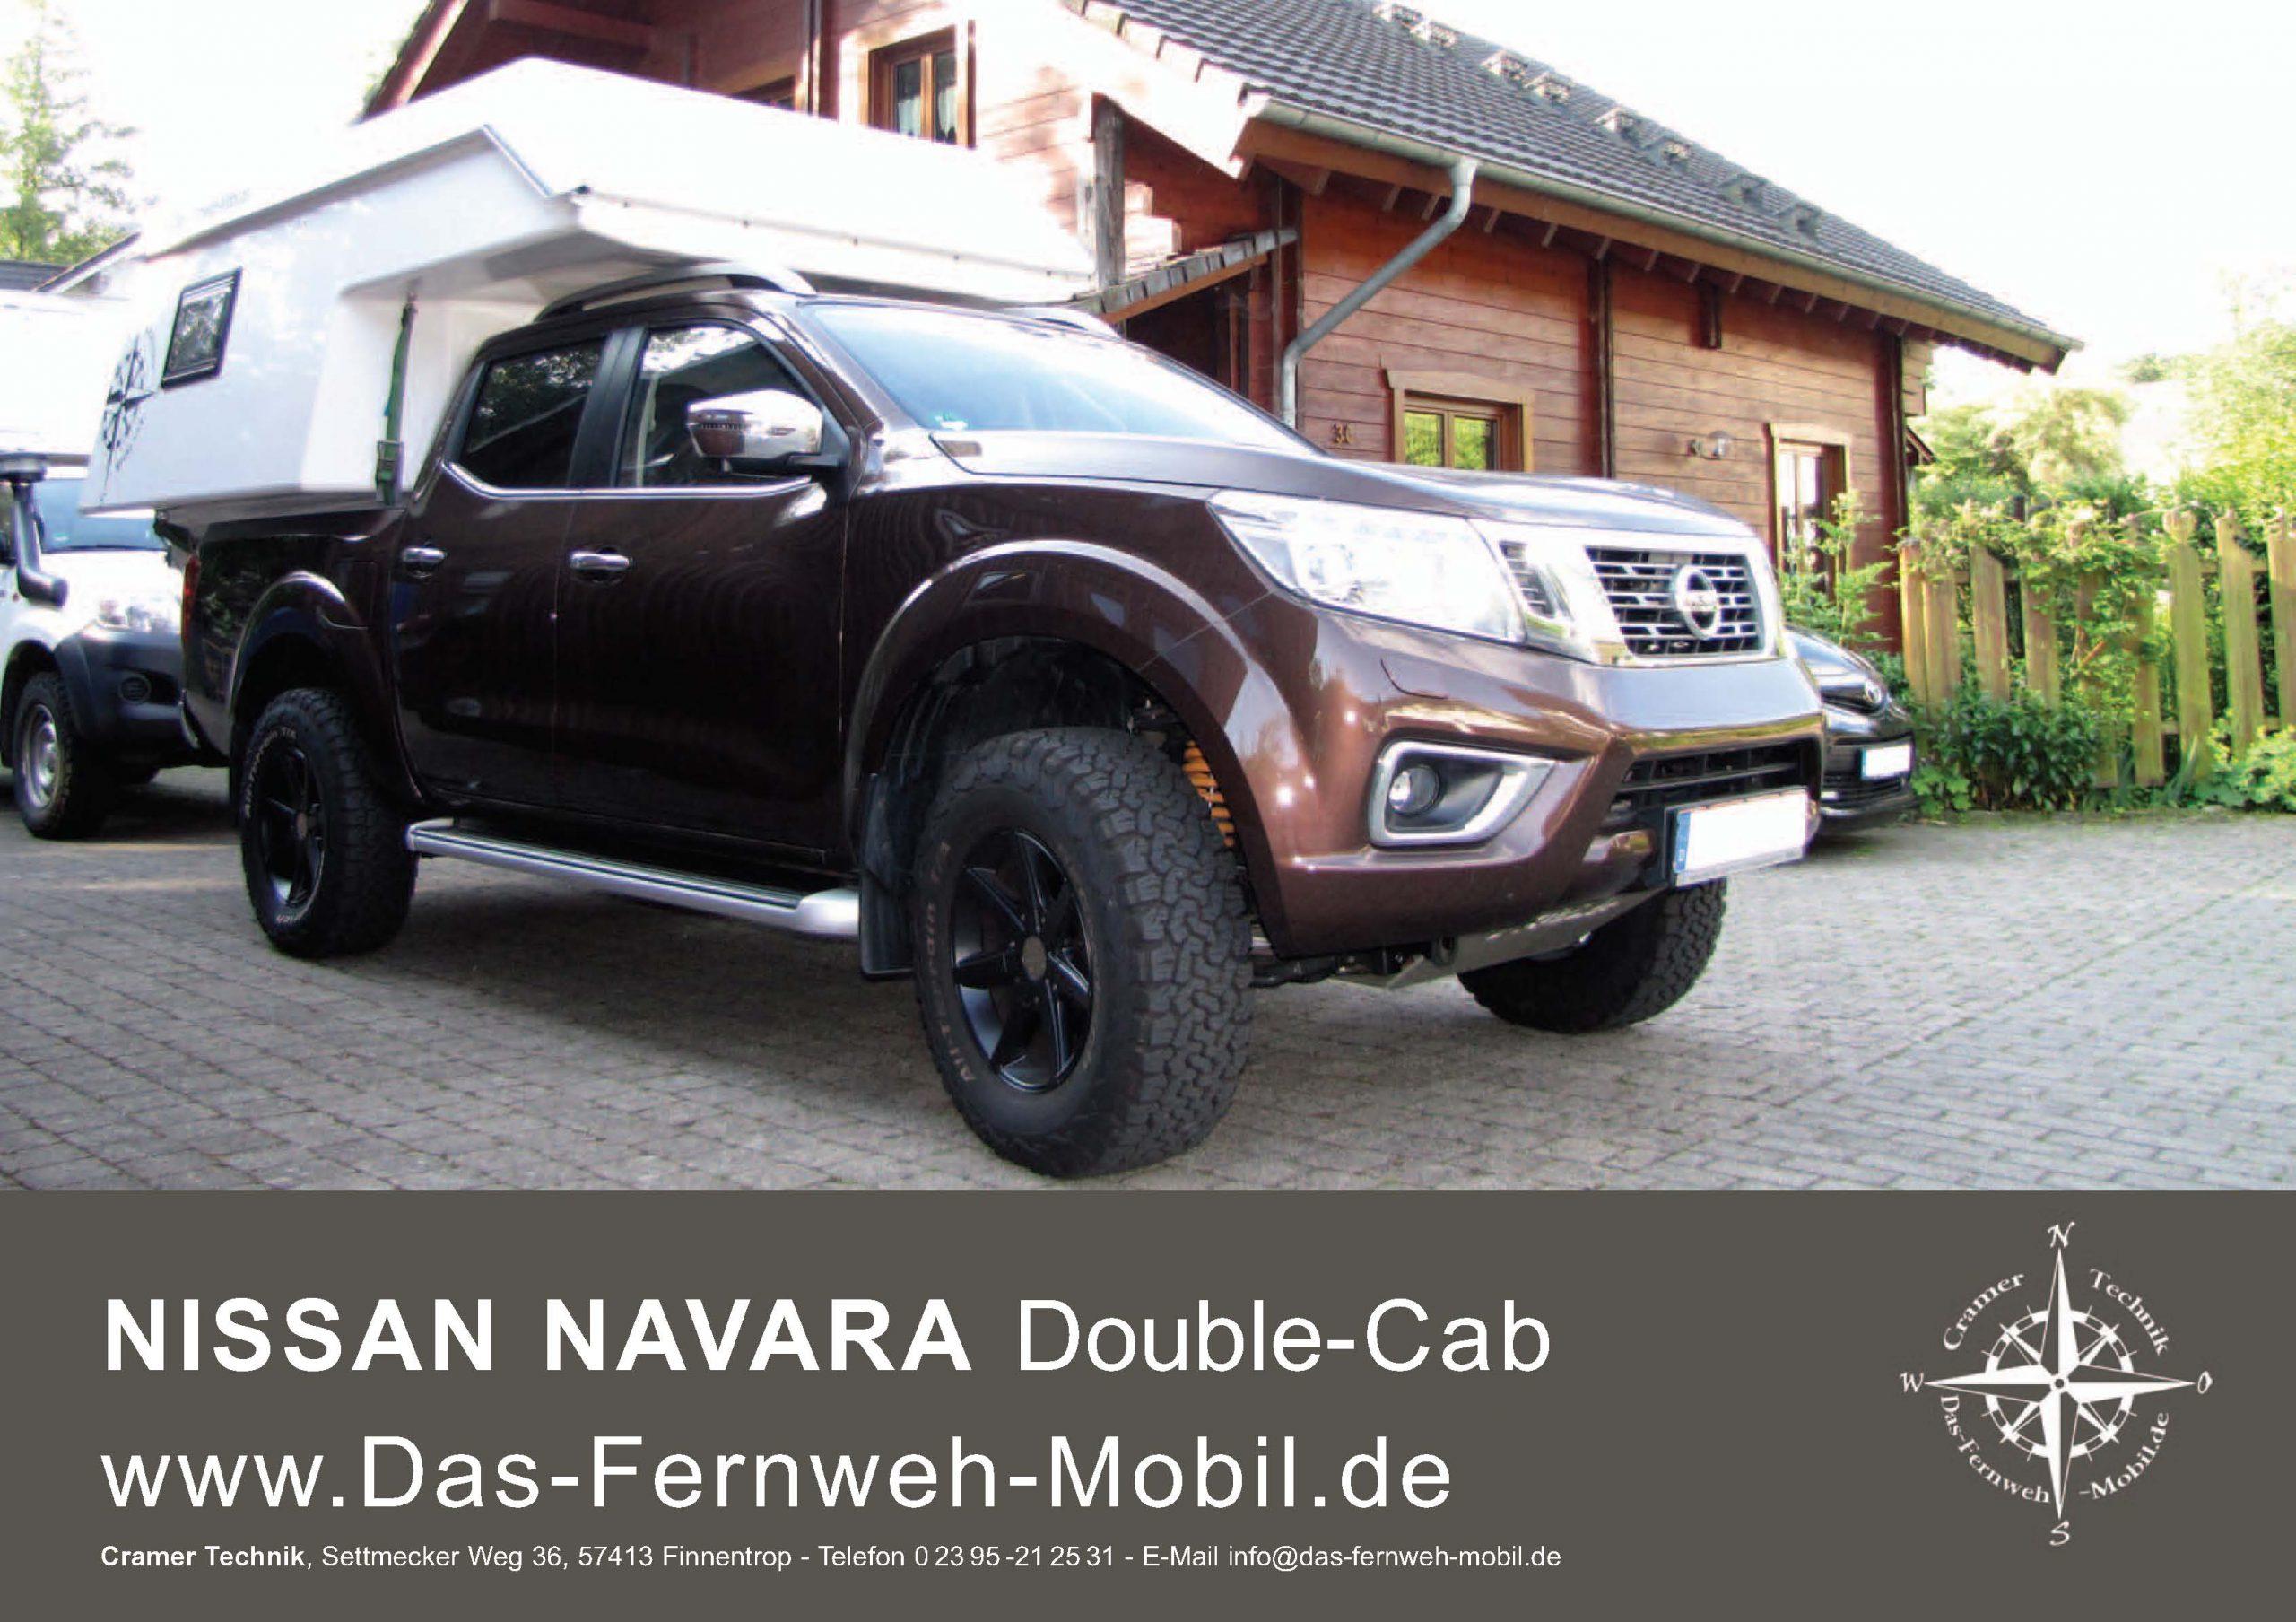 Datenblatt-Nissan-Navara-Double-Cab-102019-k_Seite_1